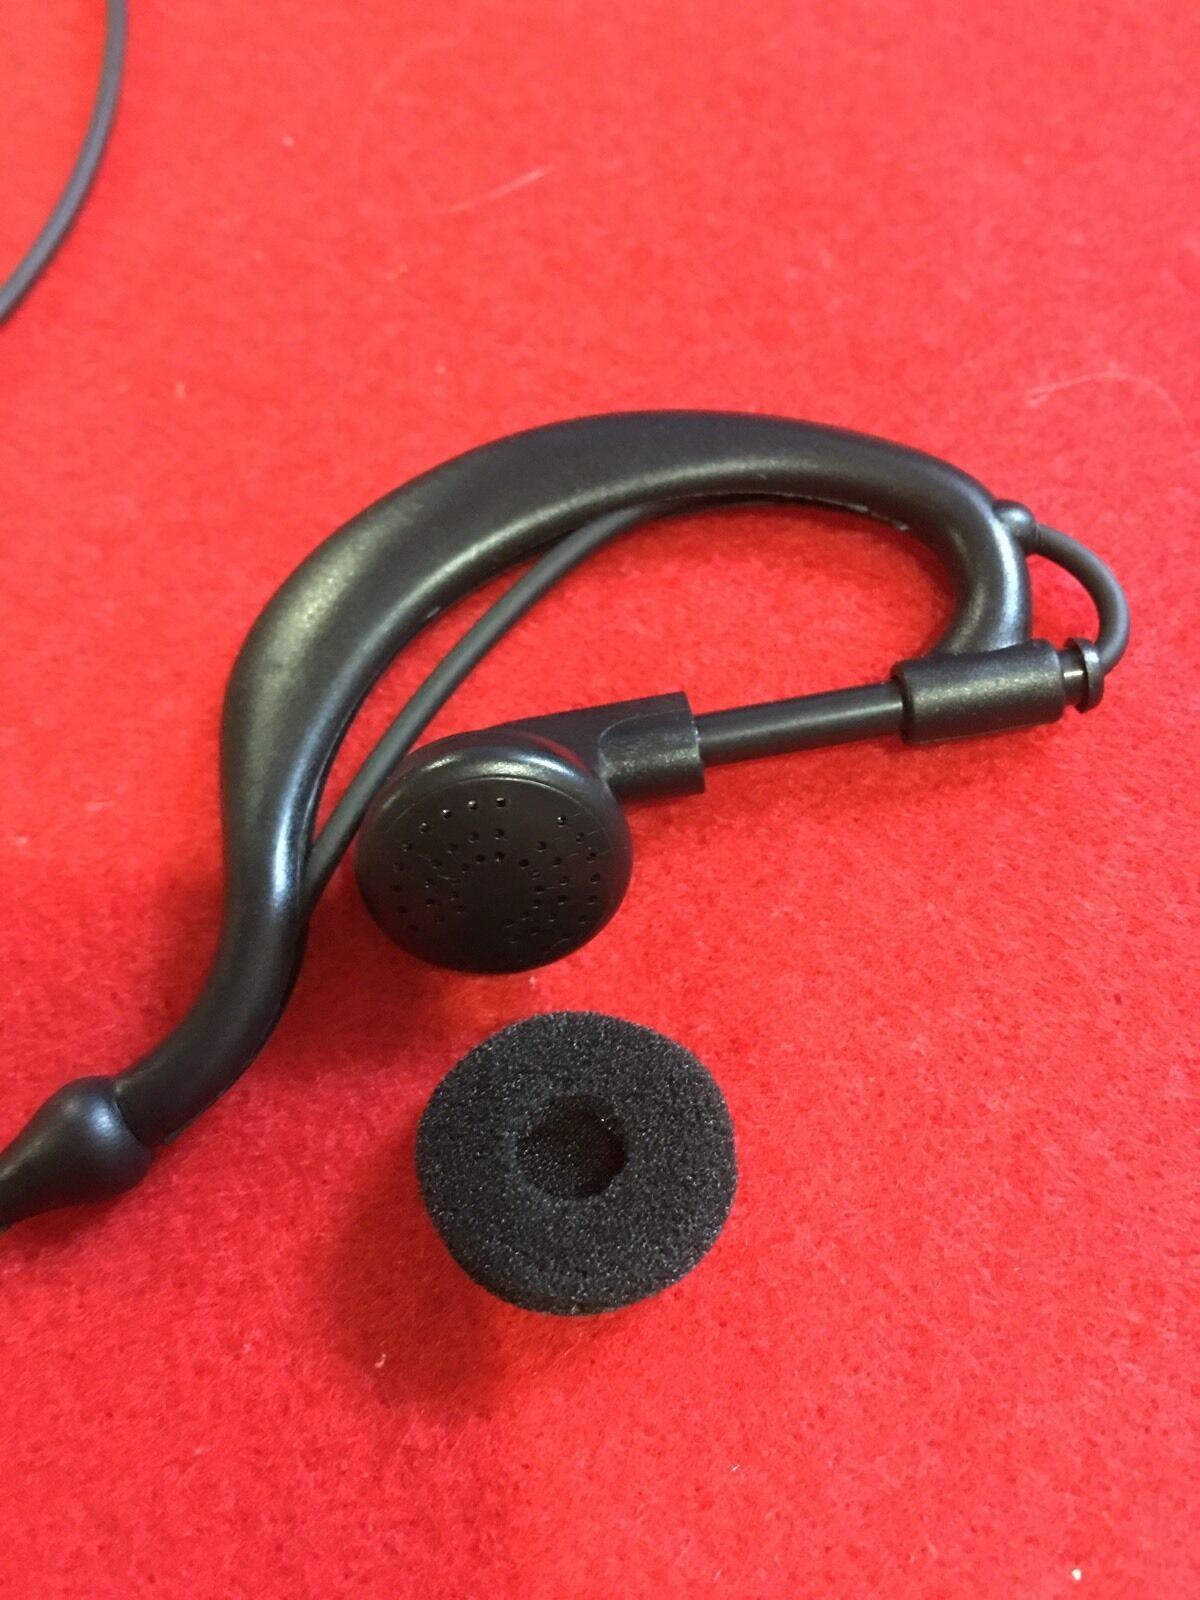 Ear Hook Type Listen Only Headset  UNIDEN HOME PATROL Radio Shack Scanner 3.5mm